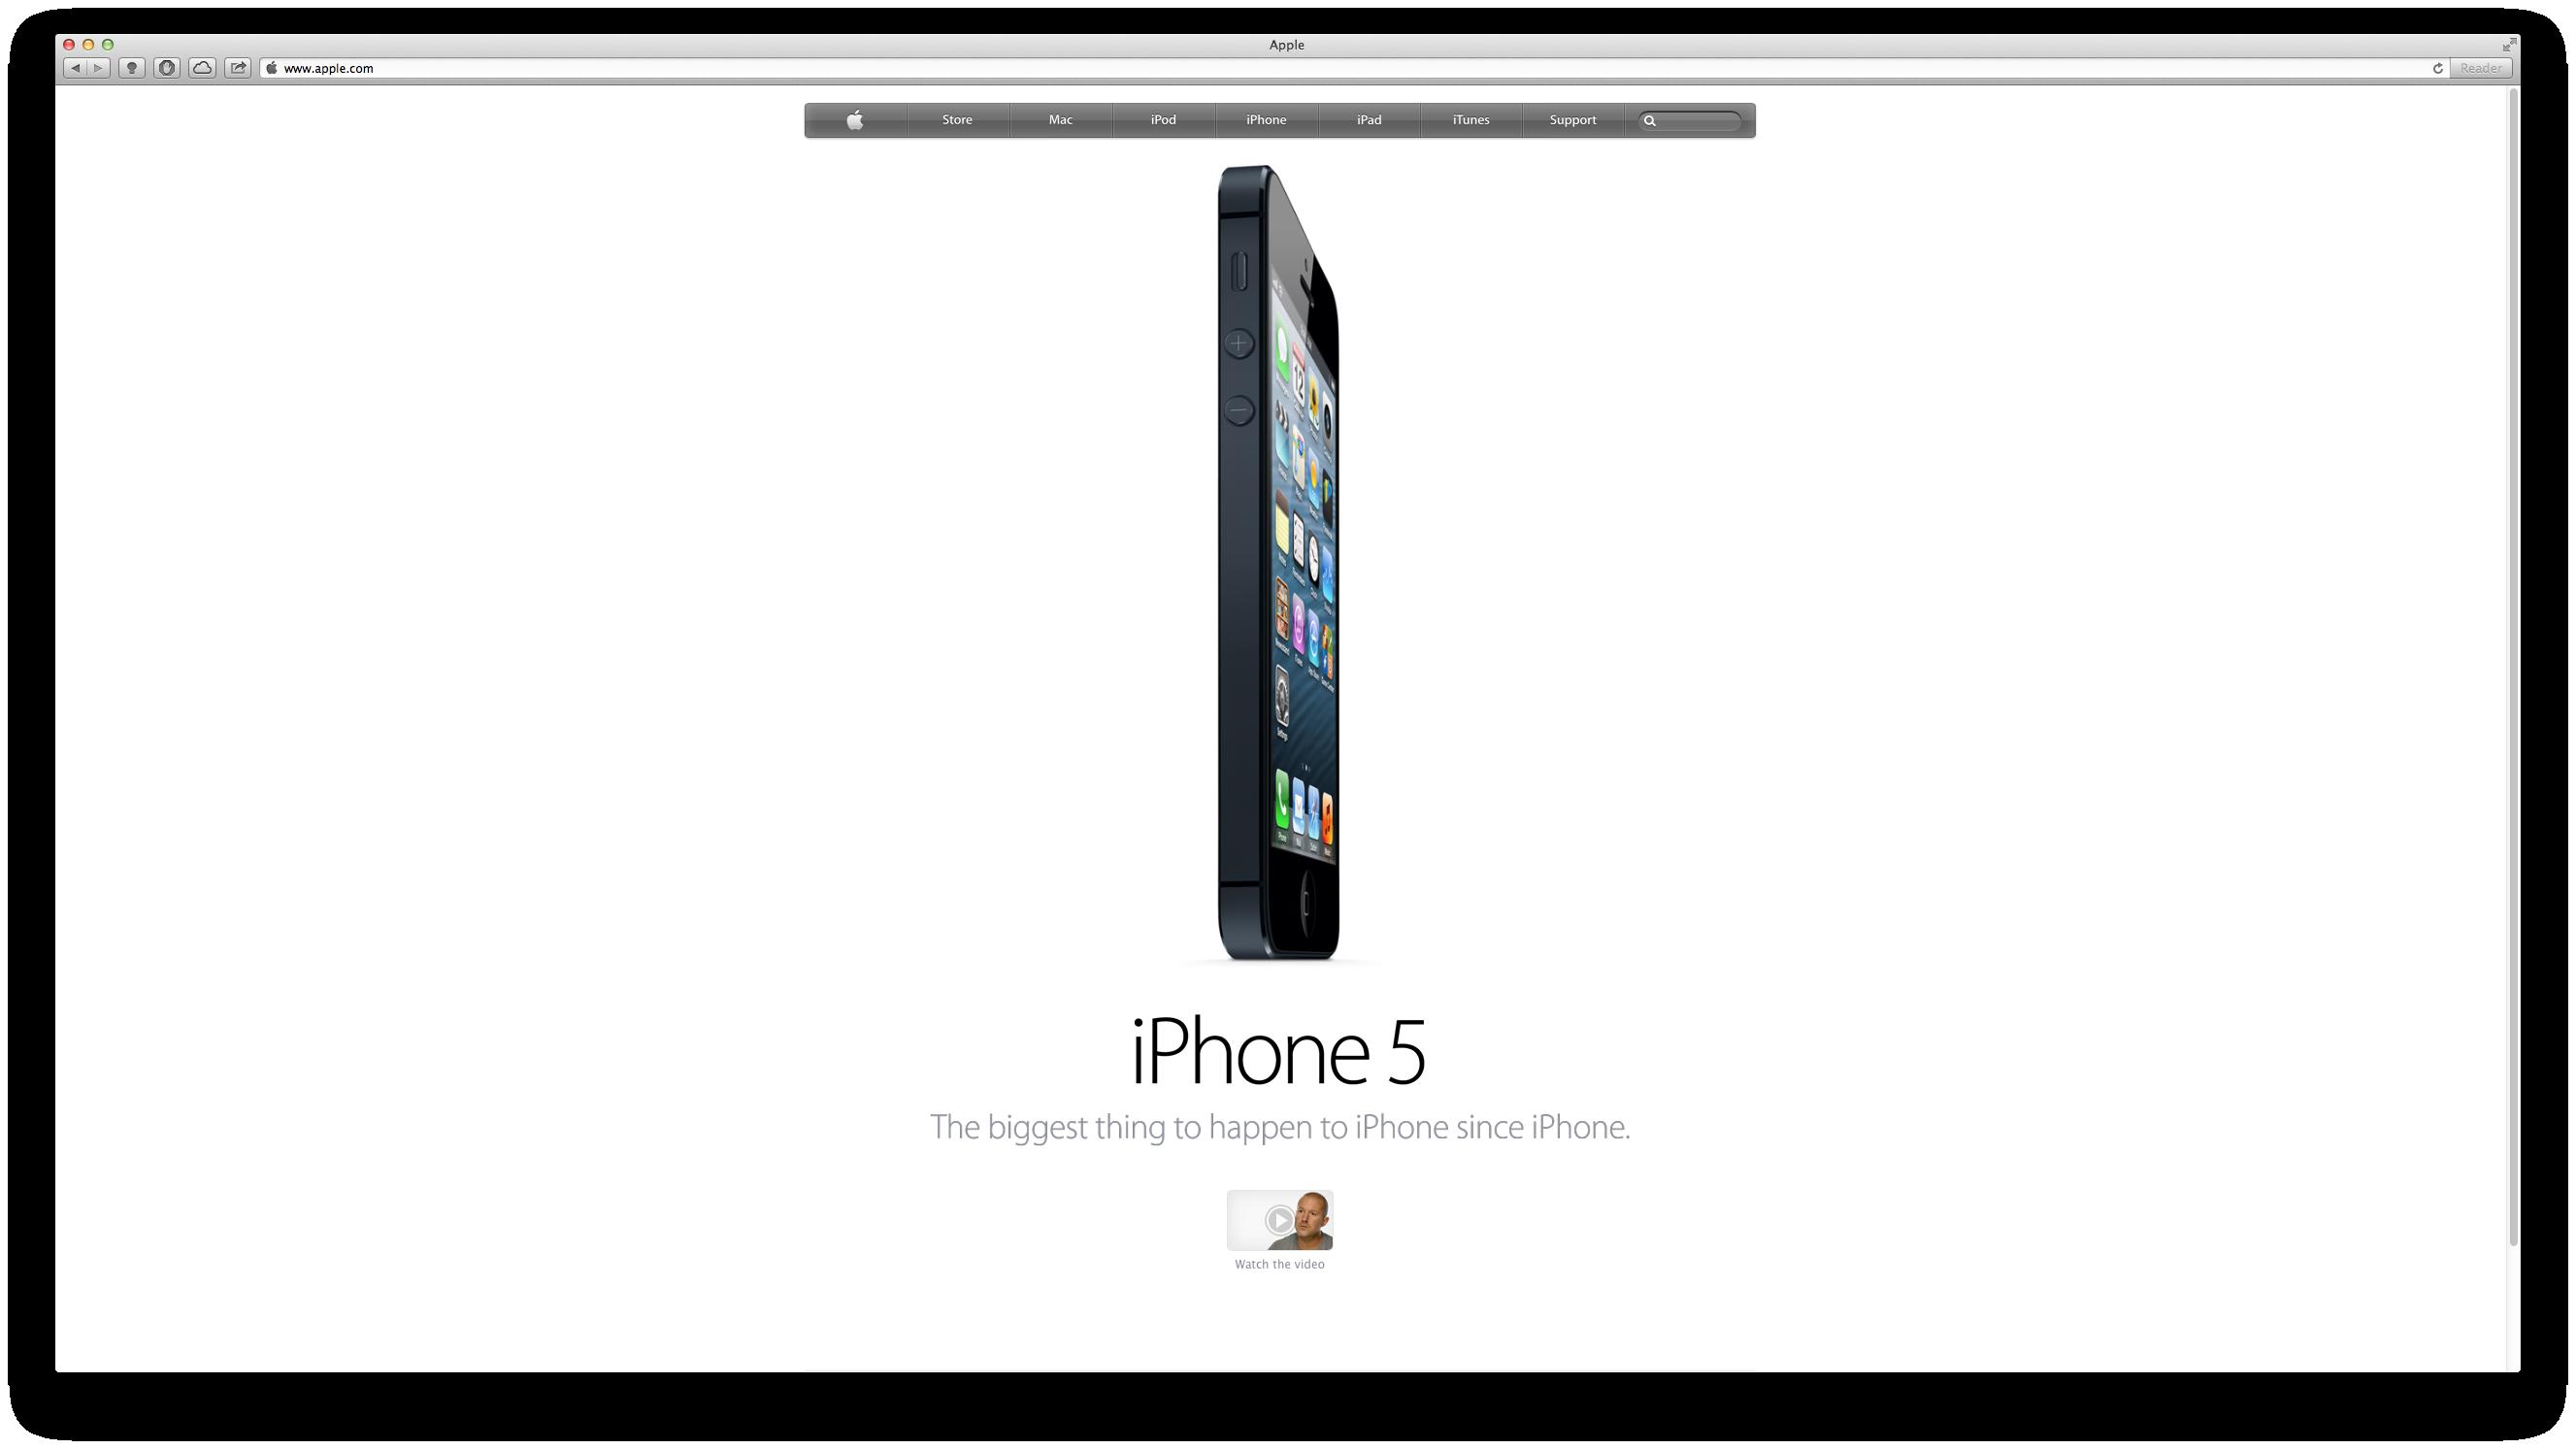 Minimalist web-design... can't wait to get mine... #iPhone5 http://www.apple.com/iphone/